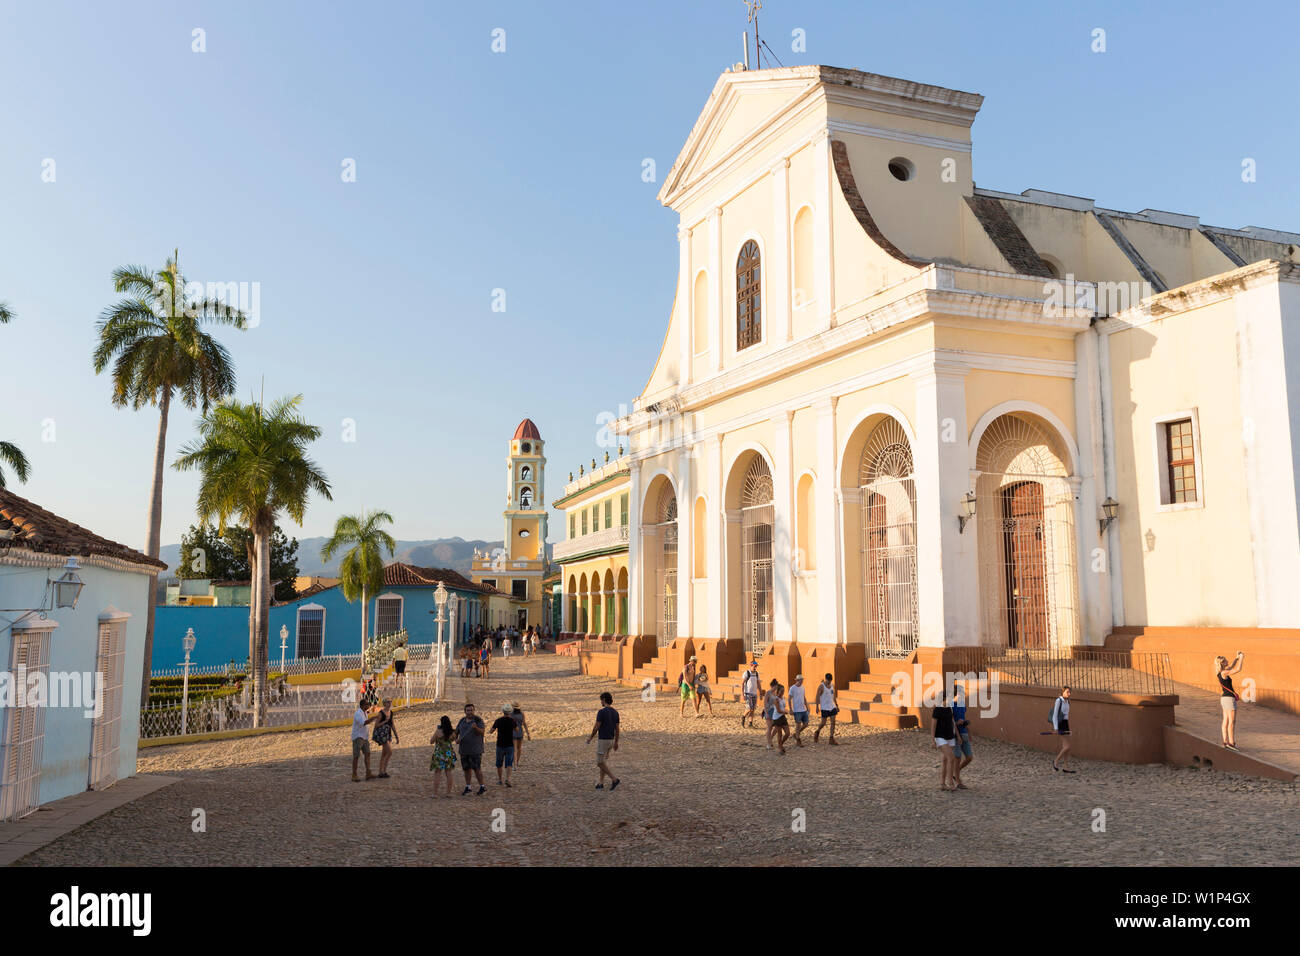 Iglesia Parroquial de la Santisima Trinidad at Plaza Mayor in the background the bell tower of Museo Nacional de la Lucha, formerly Iglesia y Convento - Stock Image